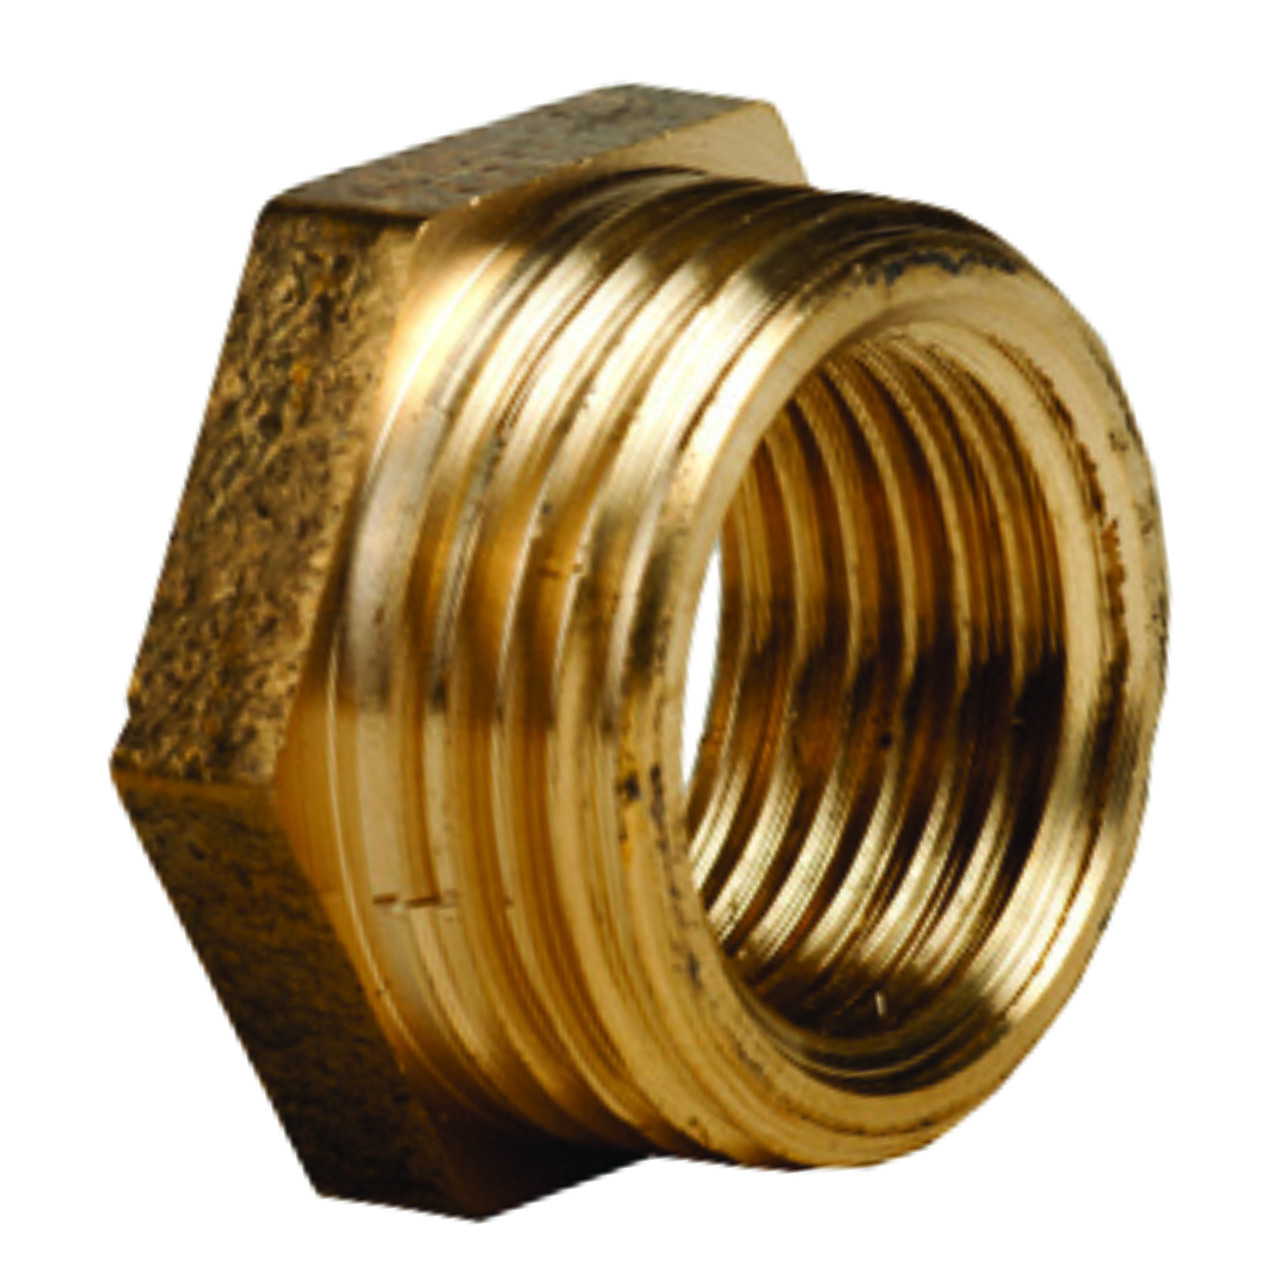 "042 1""x3/4"" Brass Reducing Bush MI x FI"